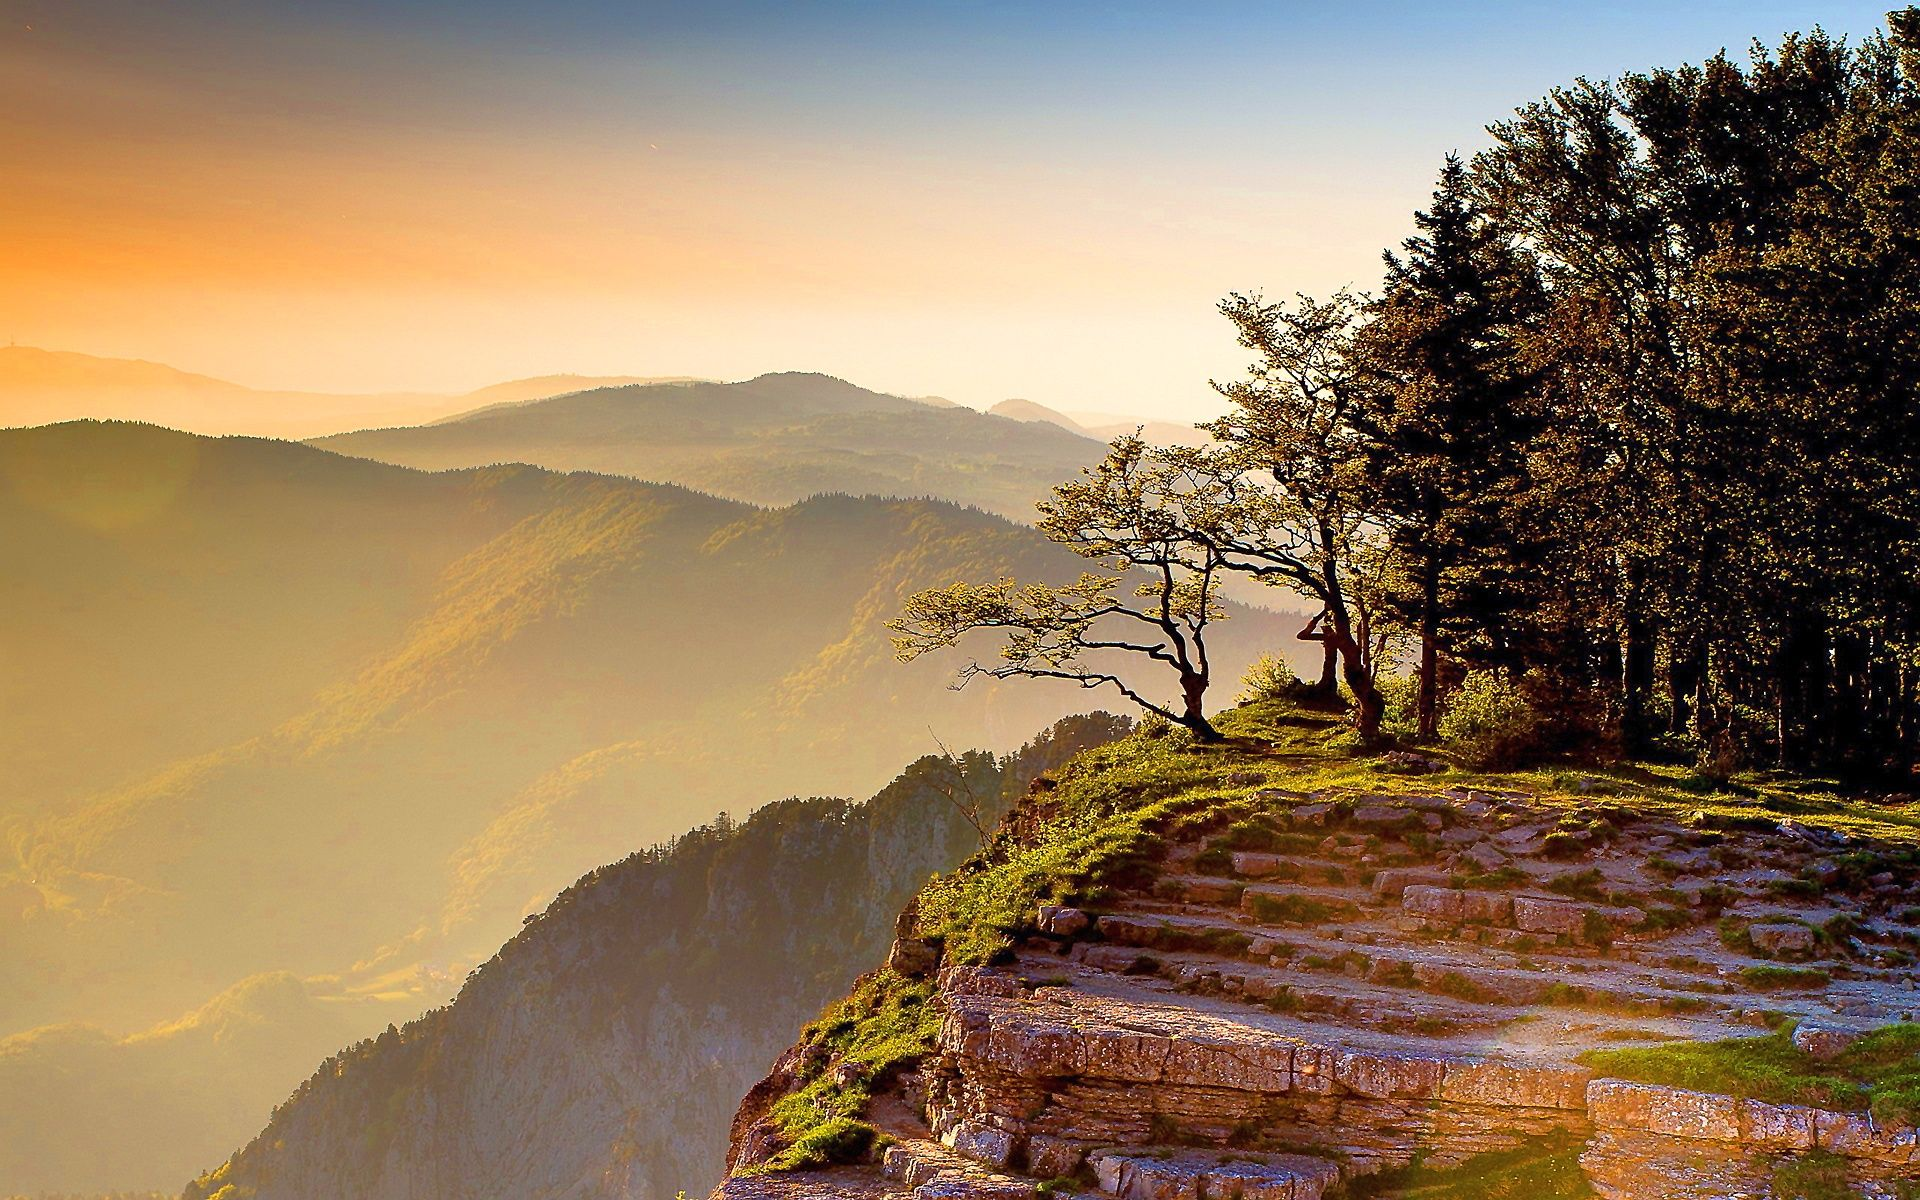 Mountain Sunset Wallpaper Phone NS5